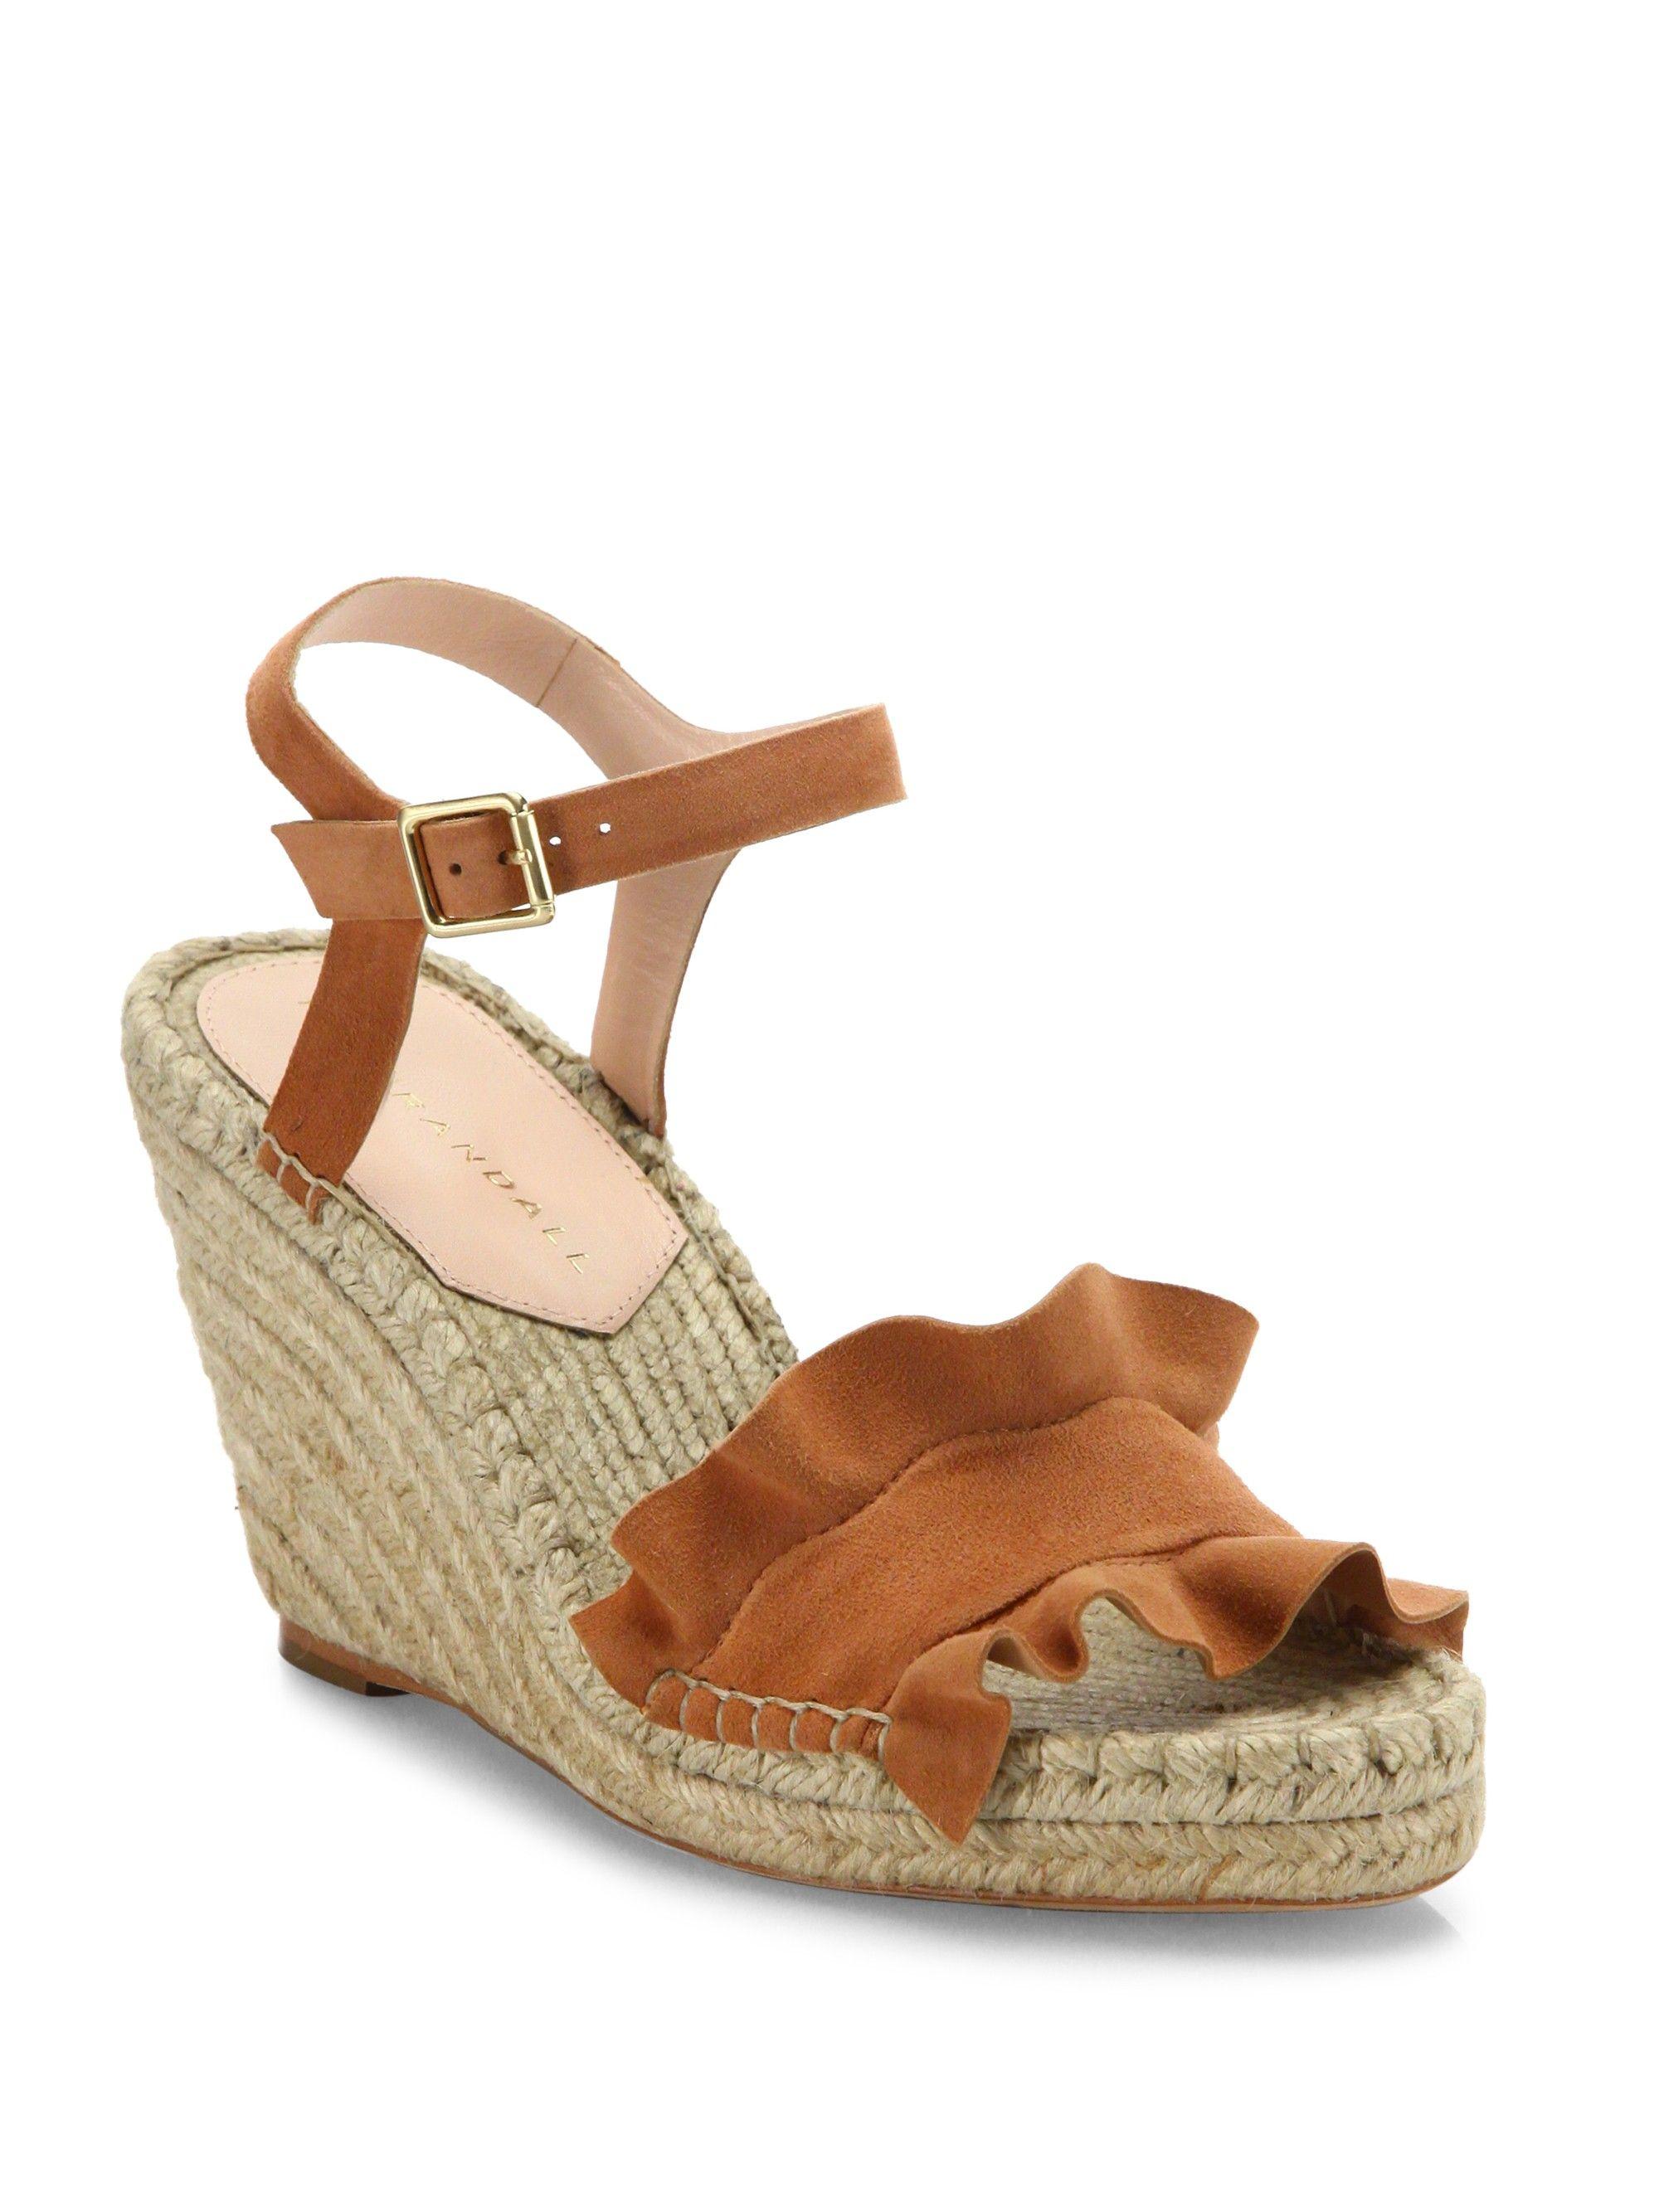 727e9497432 Gabby Ruffle Suede Espadrille Wedge Sandals by Loeffler Randall in ...